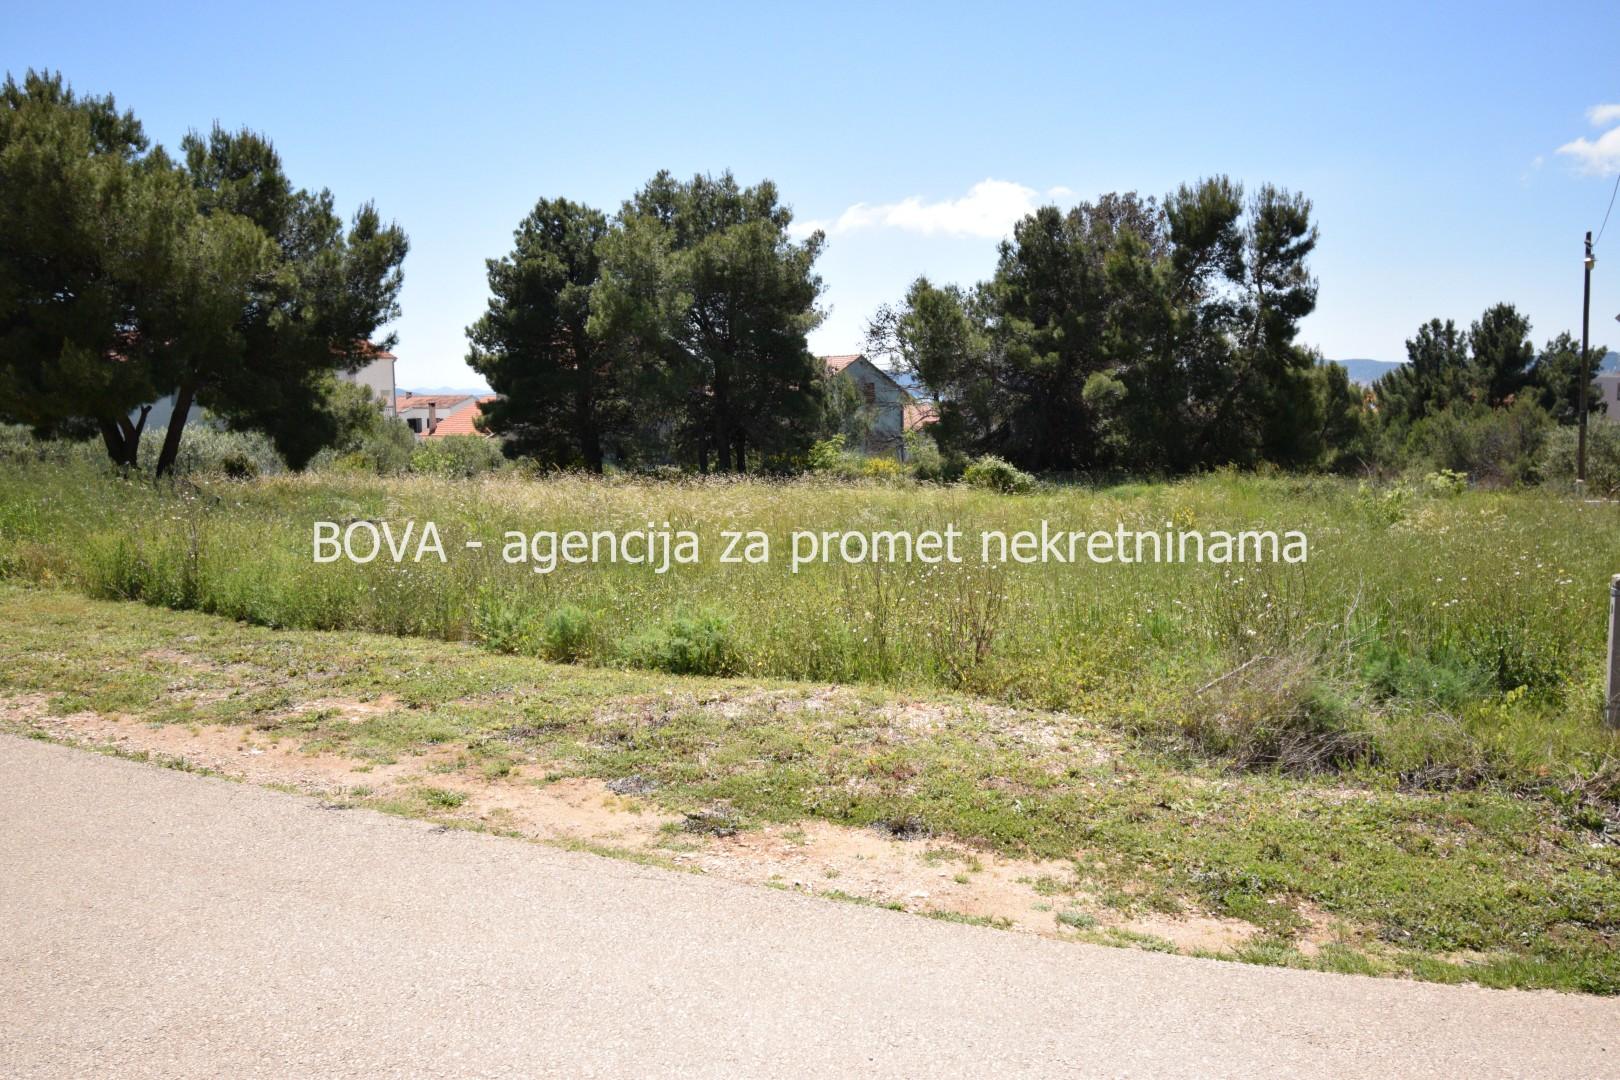 Građevinsko zemljište 698 m2 na Sokinom brigu, Zadar *POGLED NA GRAD I MORE*